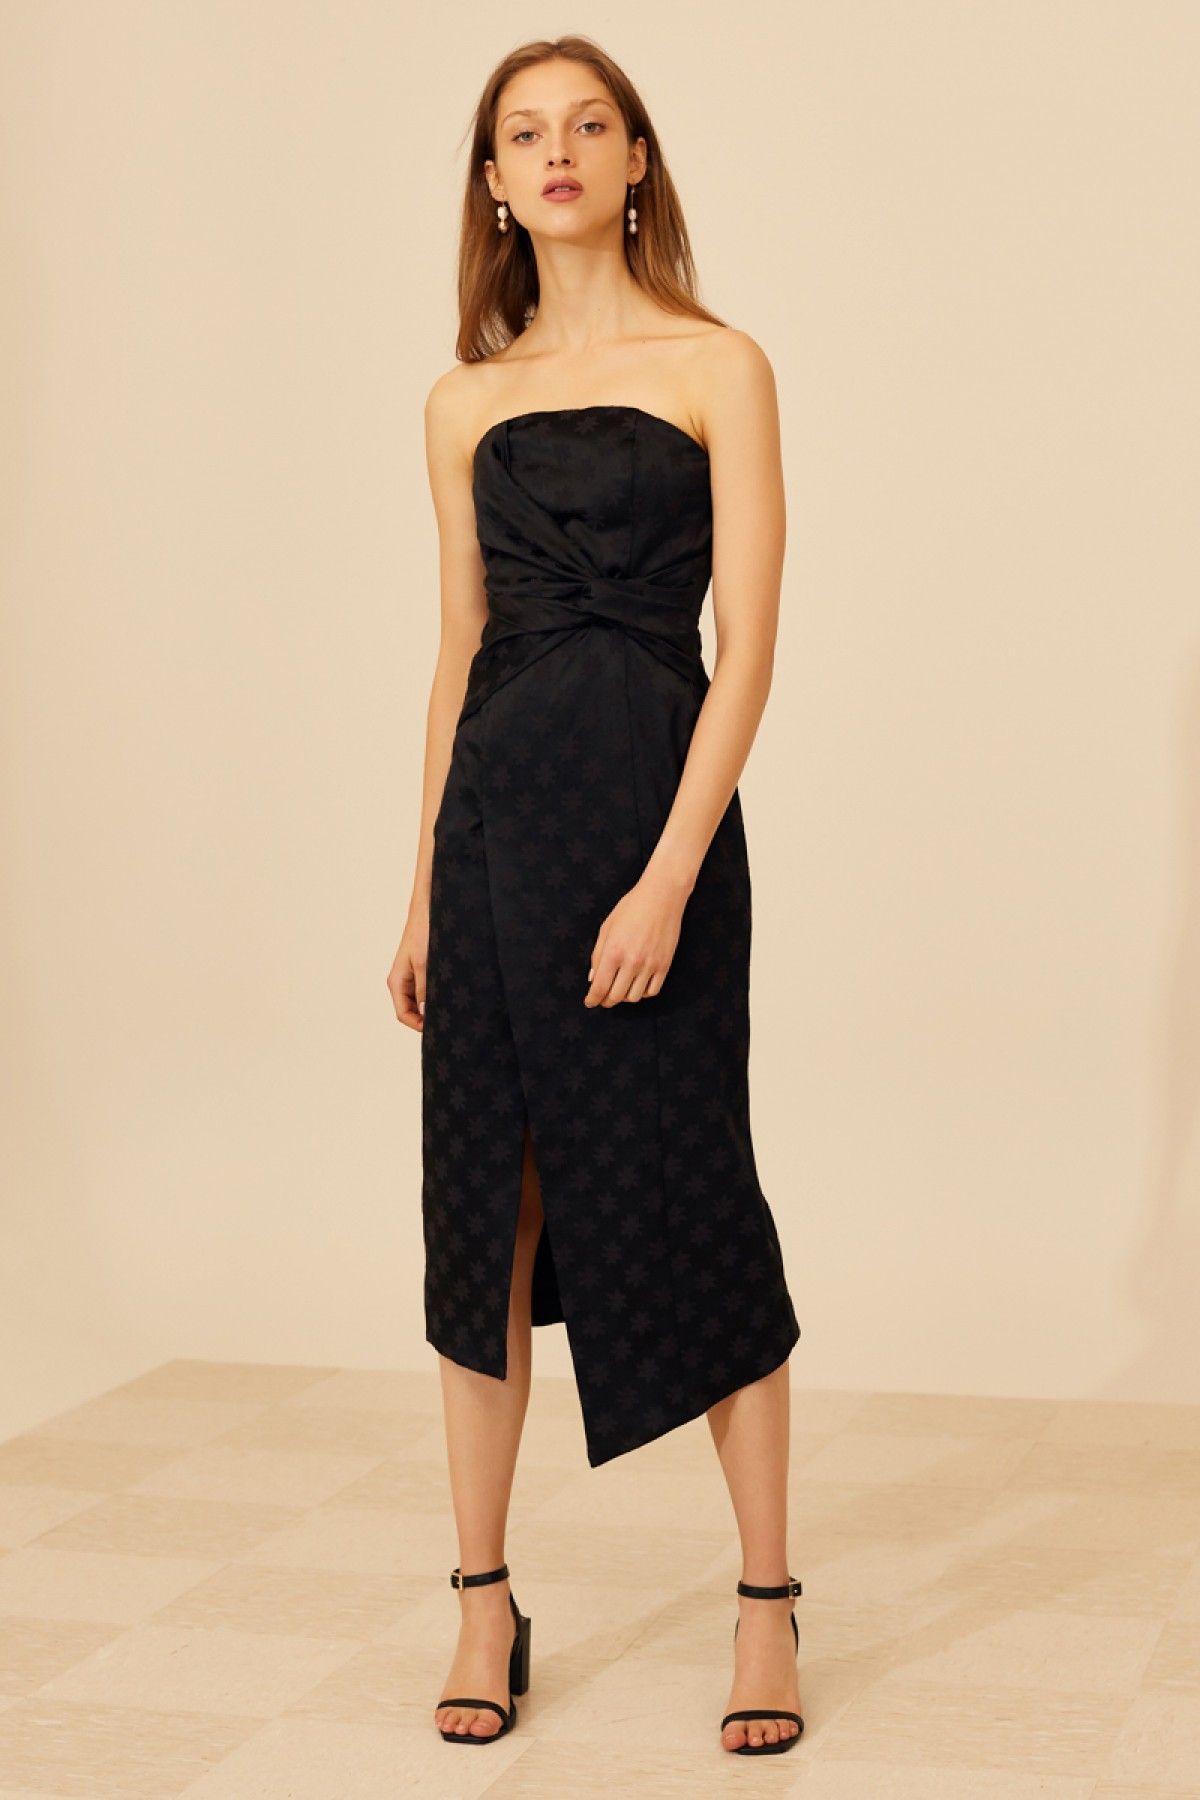 Elate Midi Dress Black C Meo Collective Bnkr Dresses Buy Midi Dress Ball Dresses [ 1800 x 1200 Pixel ]